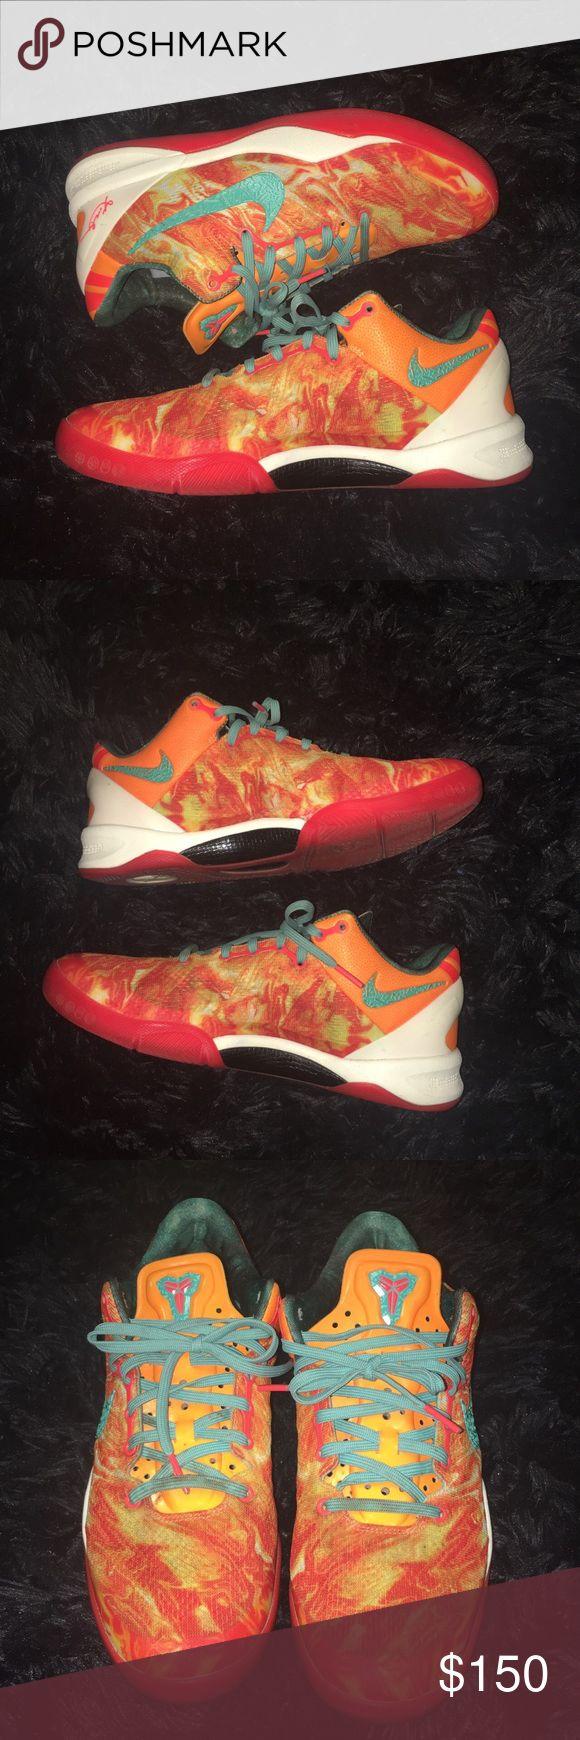 141b4706d027 Best Nike Kobe 8 Elite Cheap sale Lifestyle Orange Gray 586156 8 ...